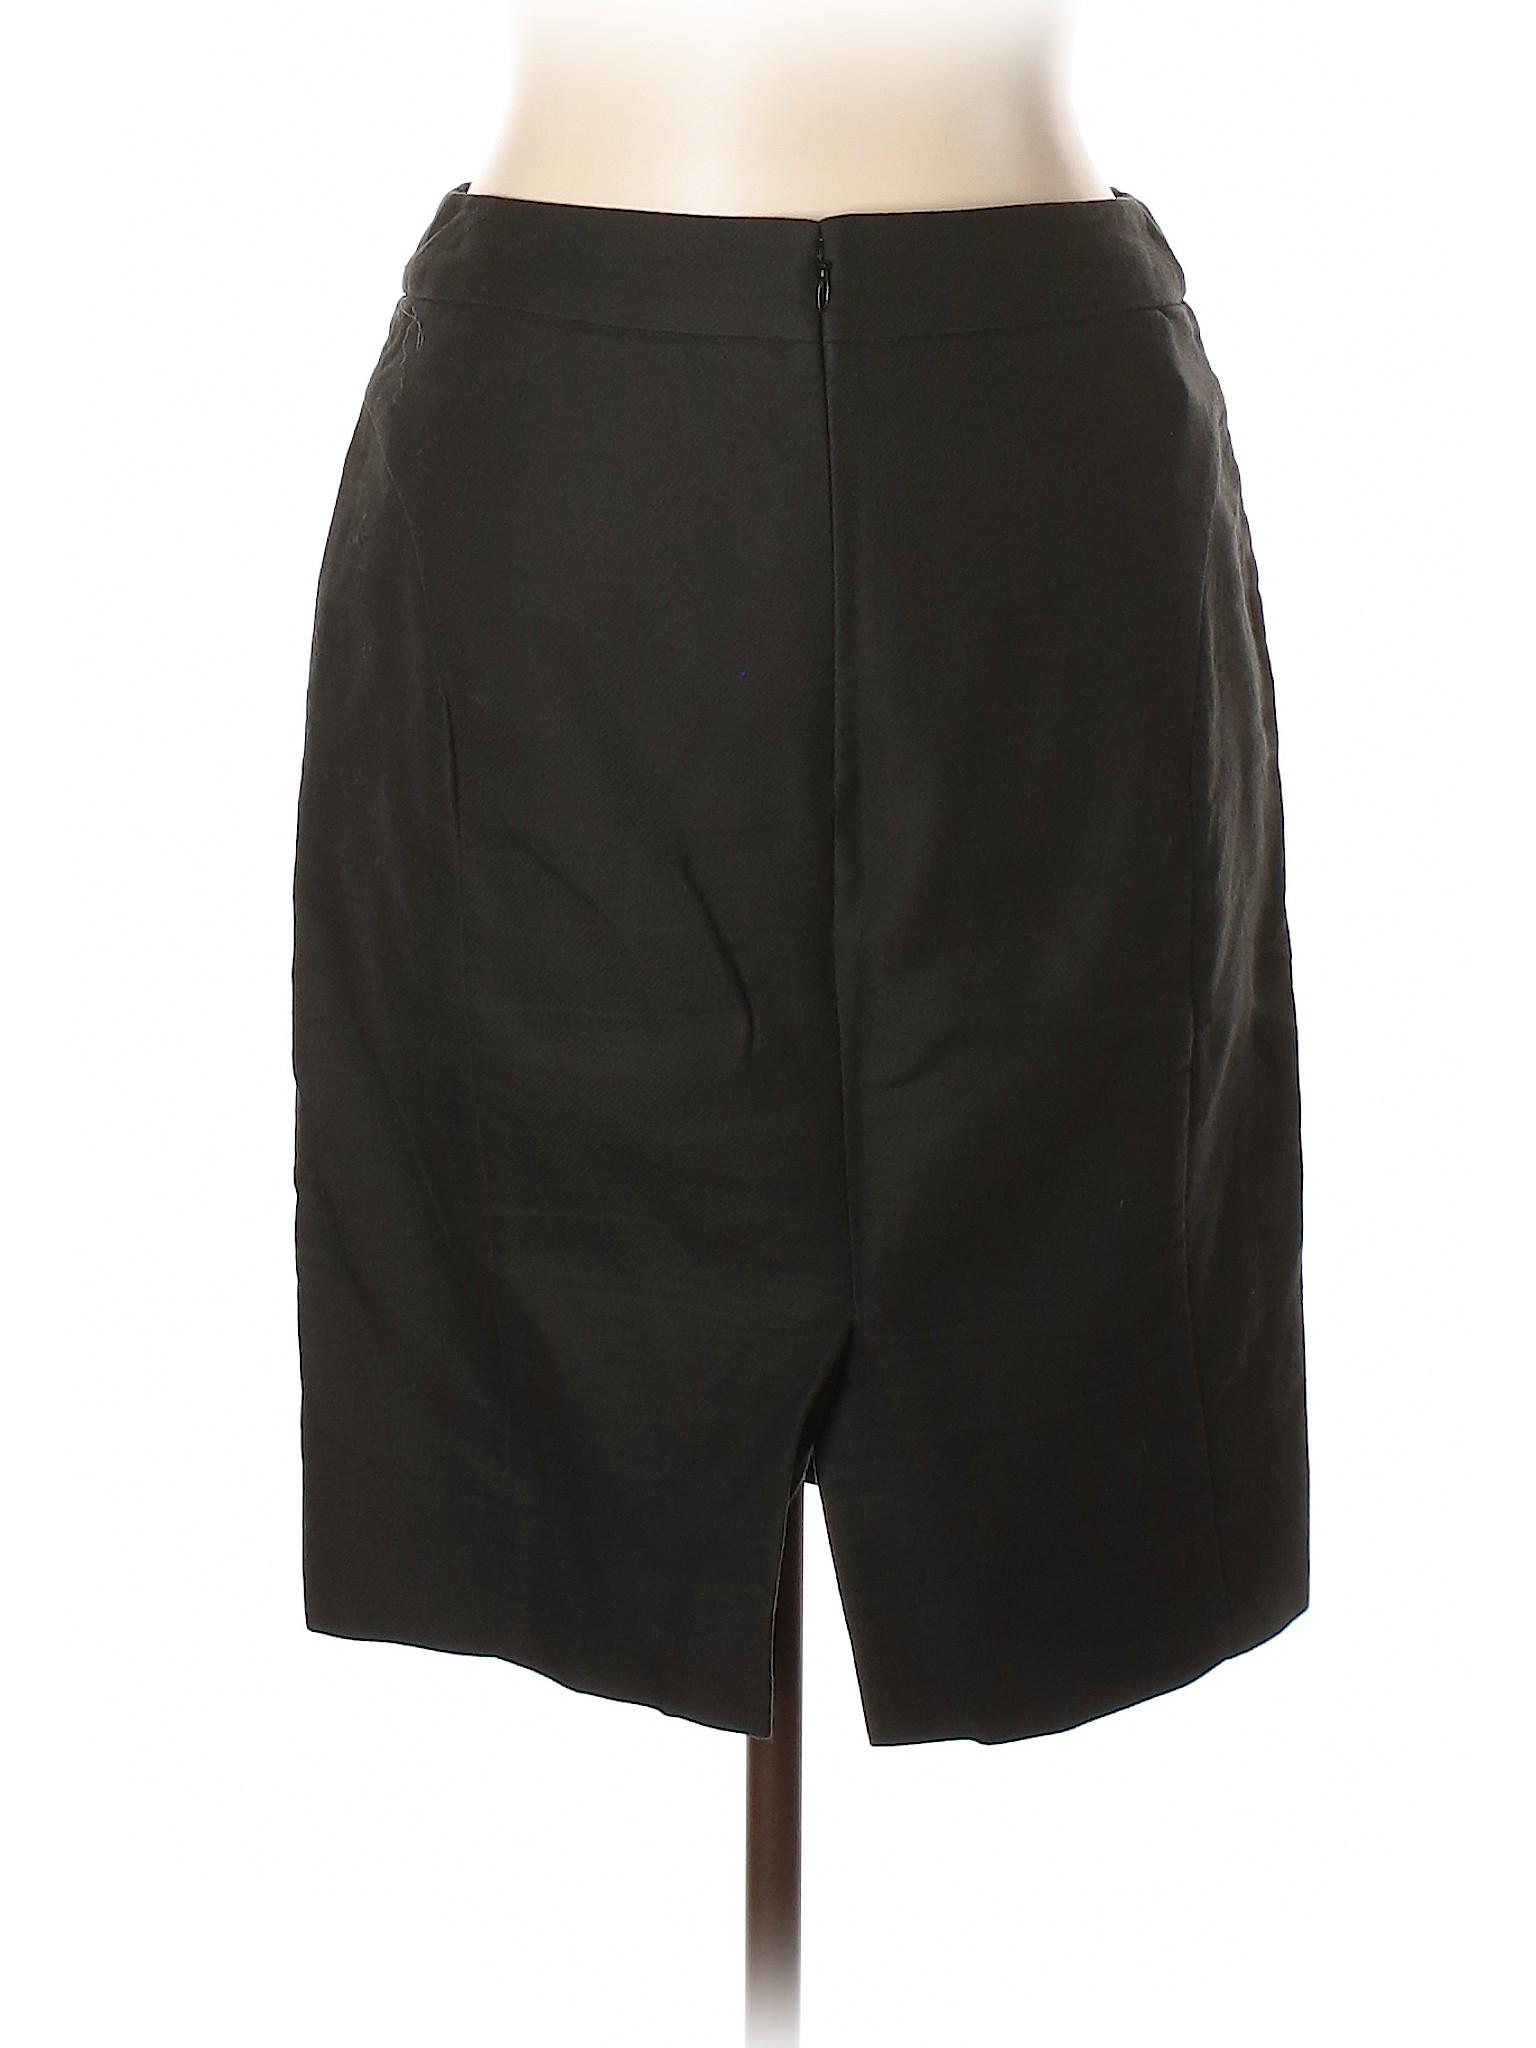 Casual Boutique Skirt Store J Crew leisure Factory qc11ABwXRW